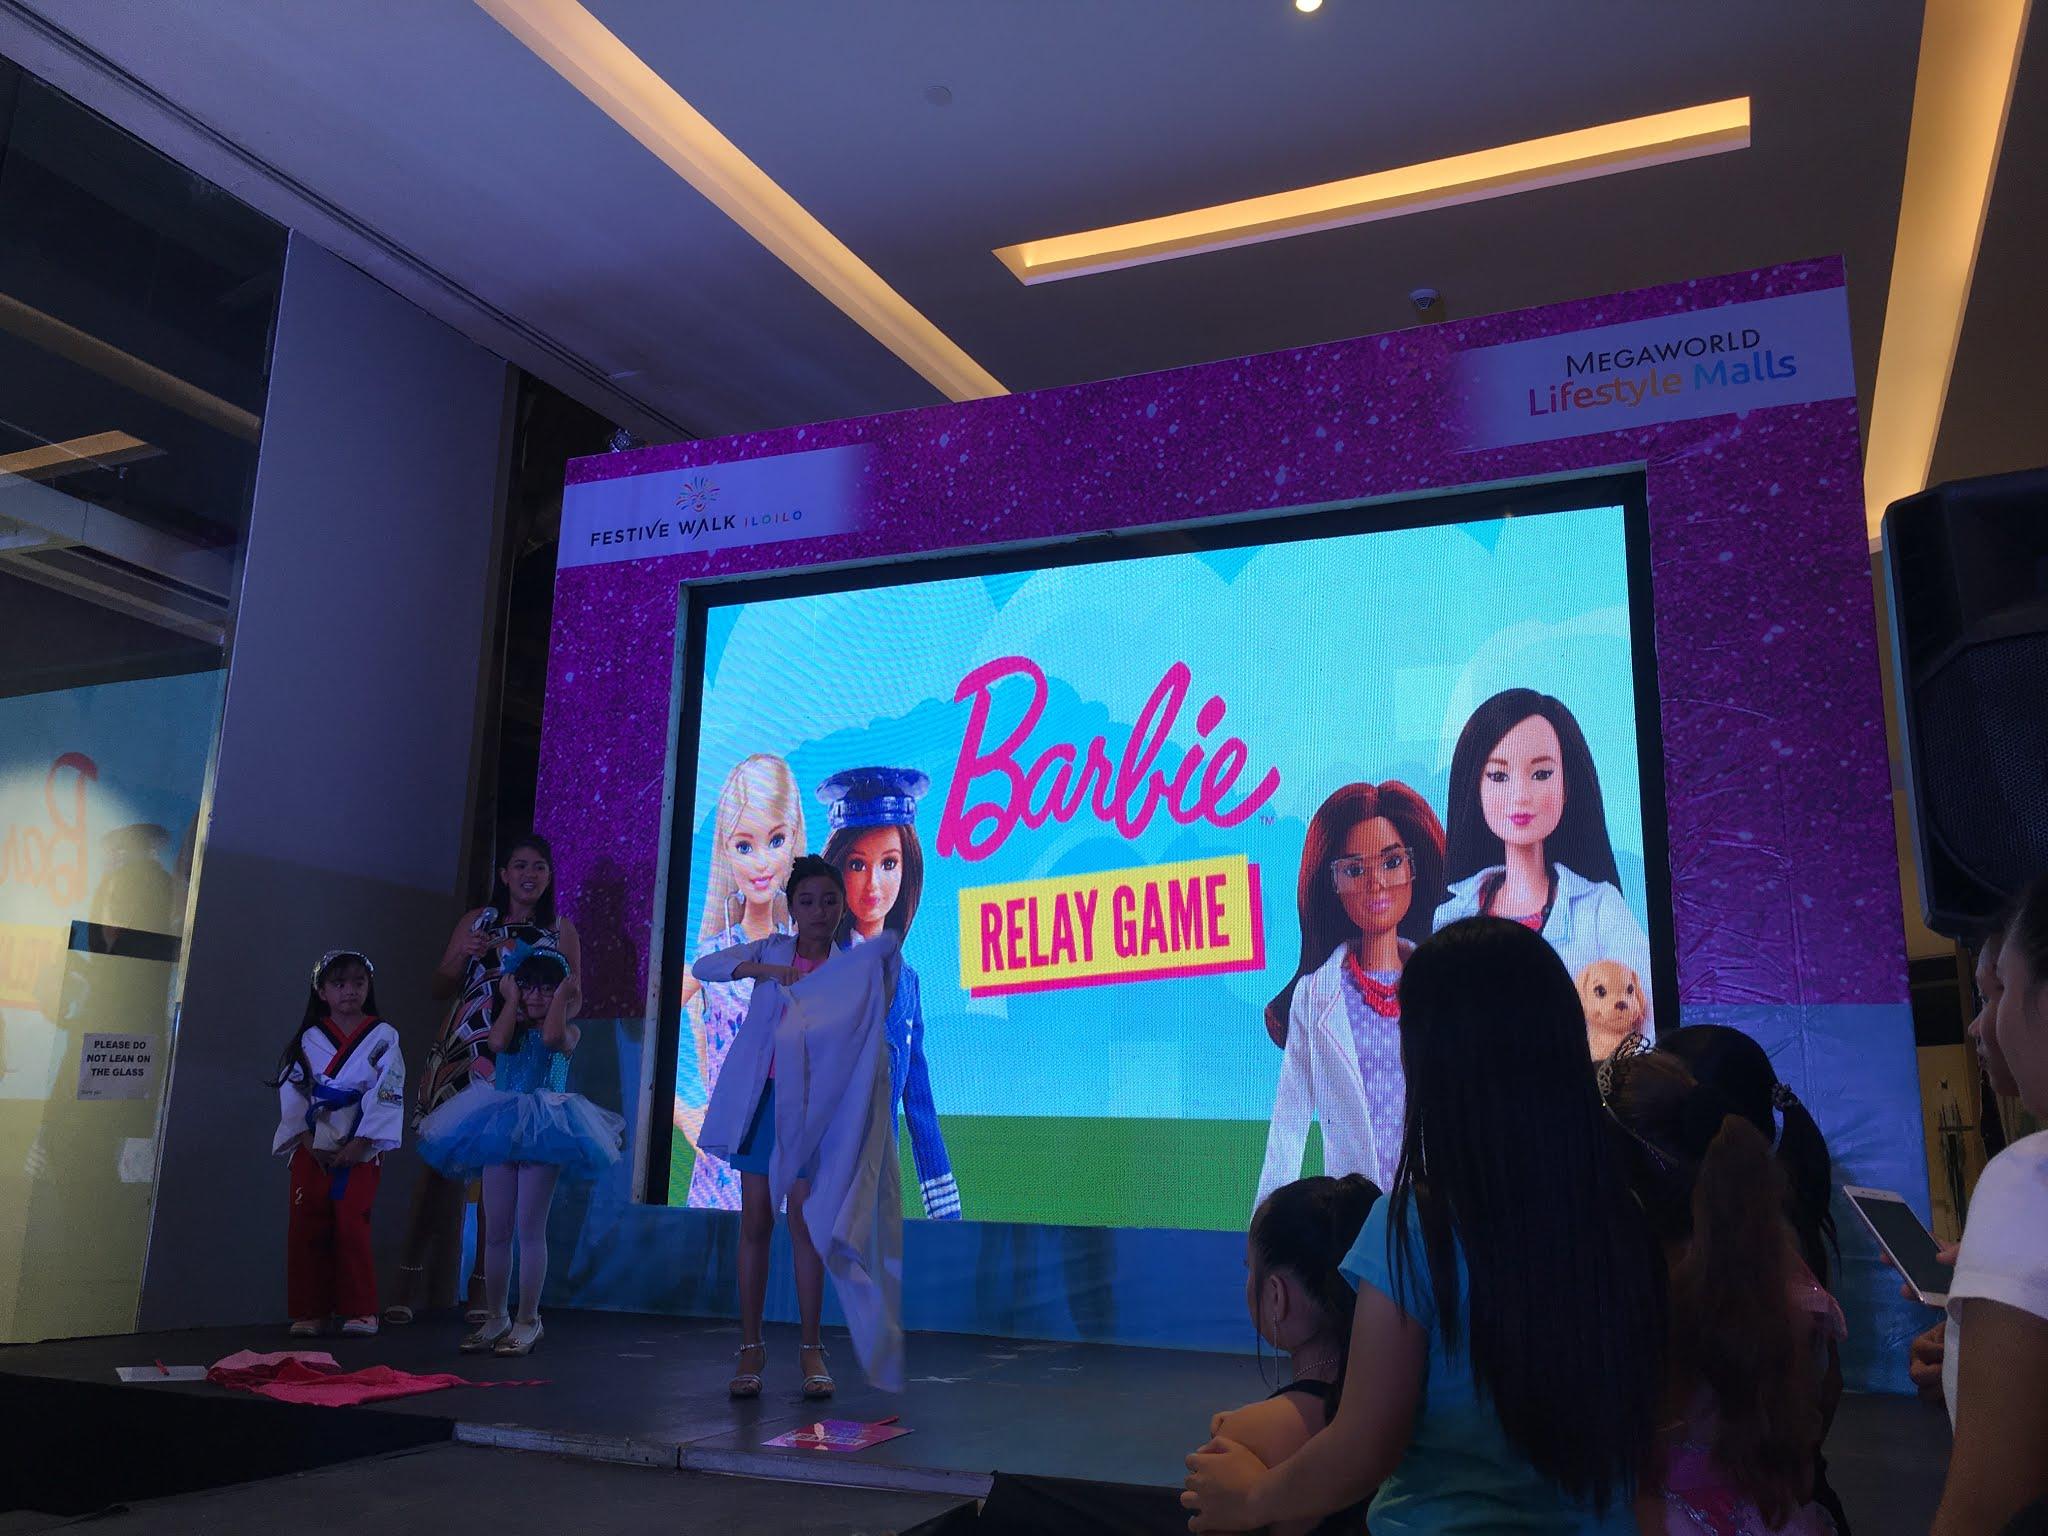 Barbie, Festive Mall, Glifestyleph, Gina Juarez